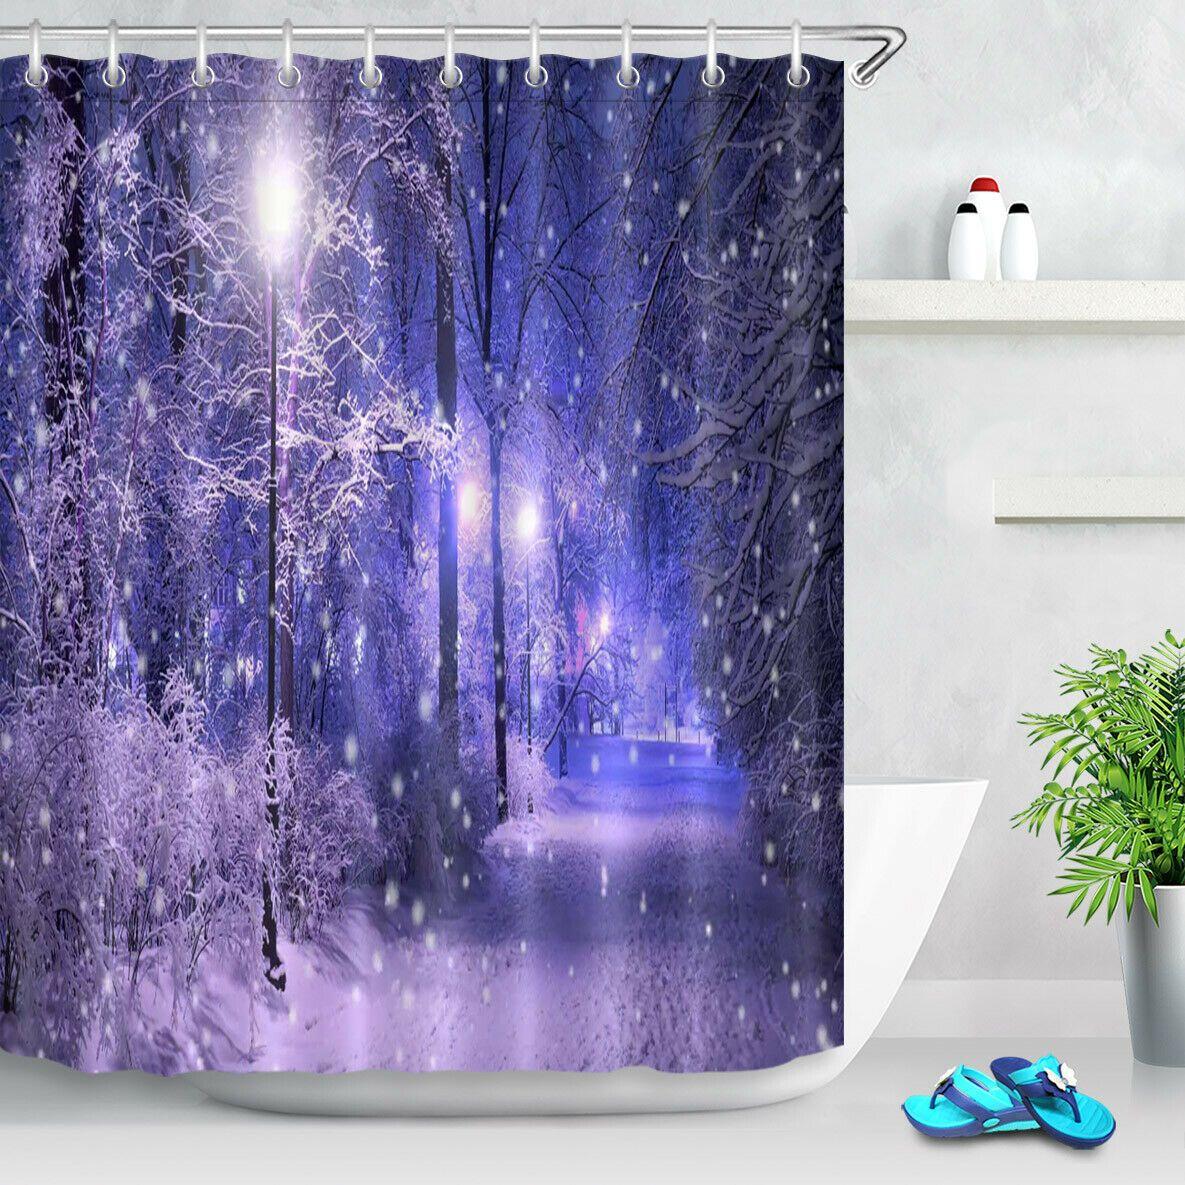 2019 Purple Night Street Light Snowflake Durable Fabric Mold Proof Bathroom Pendant Creative With 12 Hooks 180x180cm From Jackdaine 22 02